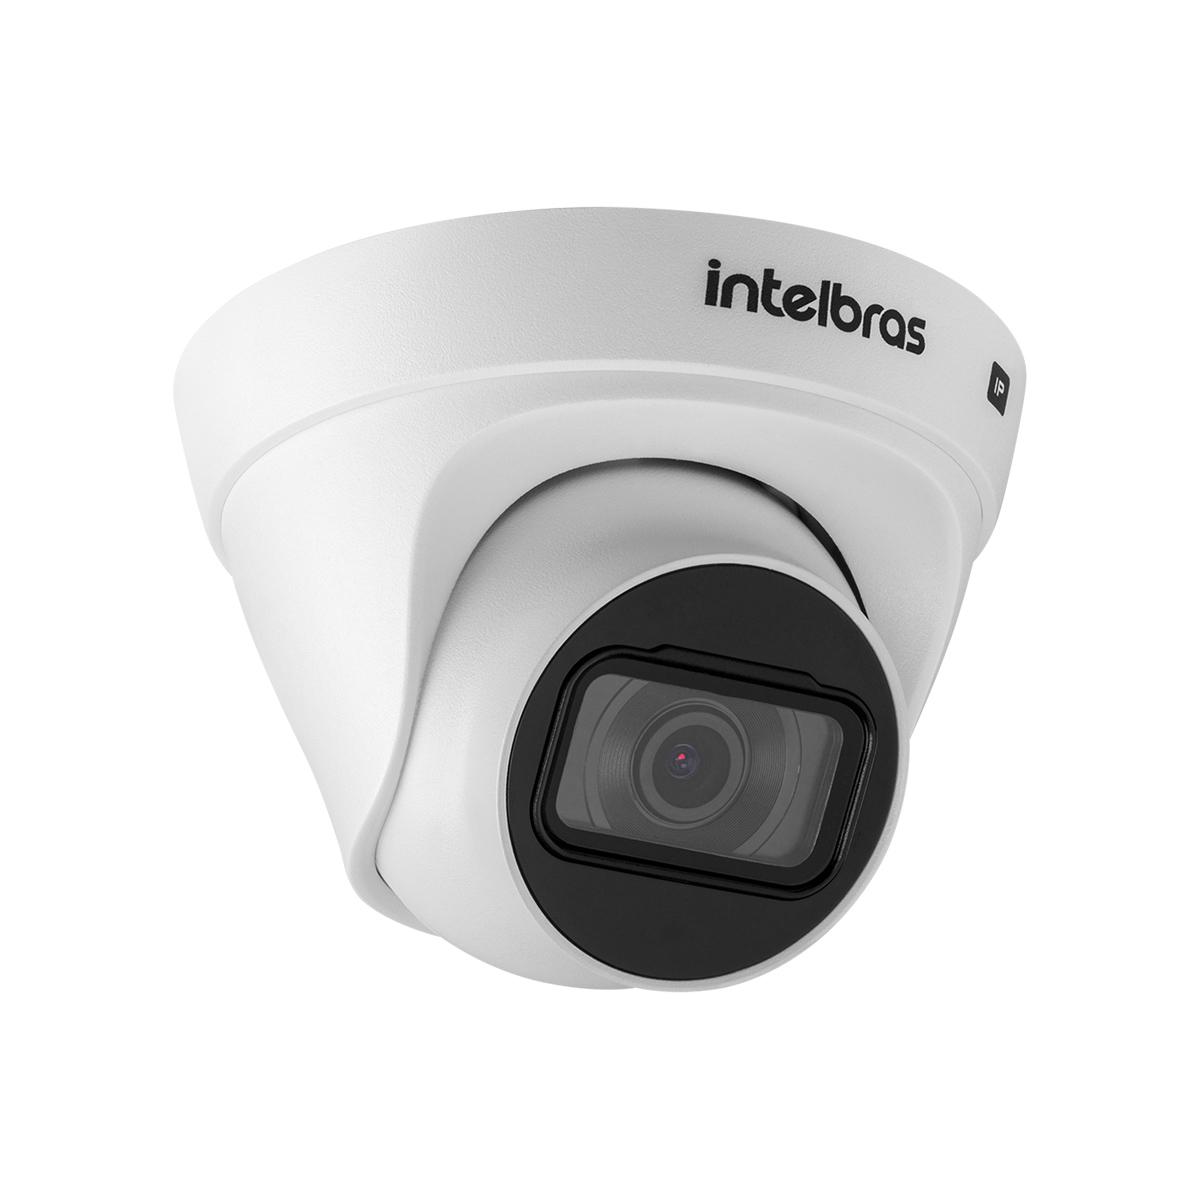 Câmera IP Dome FullHD 1080p VIP 1230 D Intelbras 2 MP